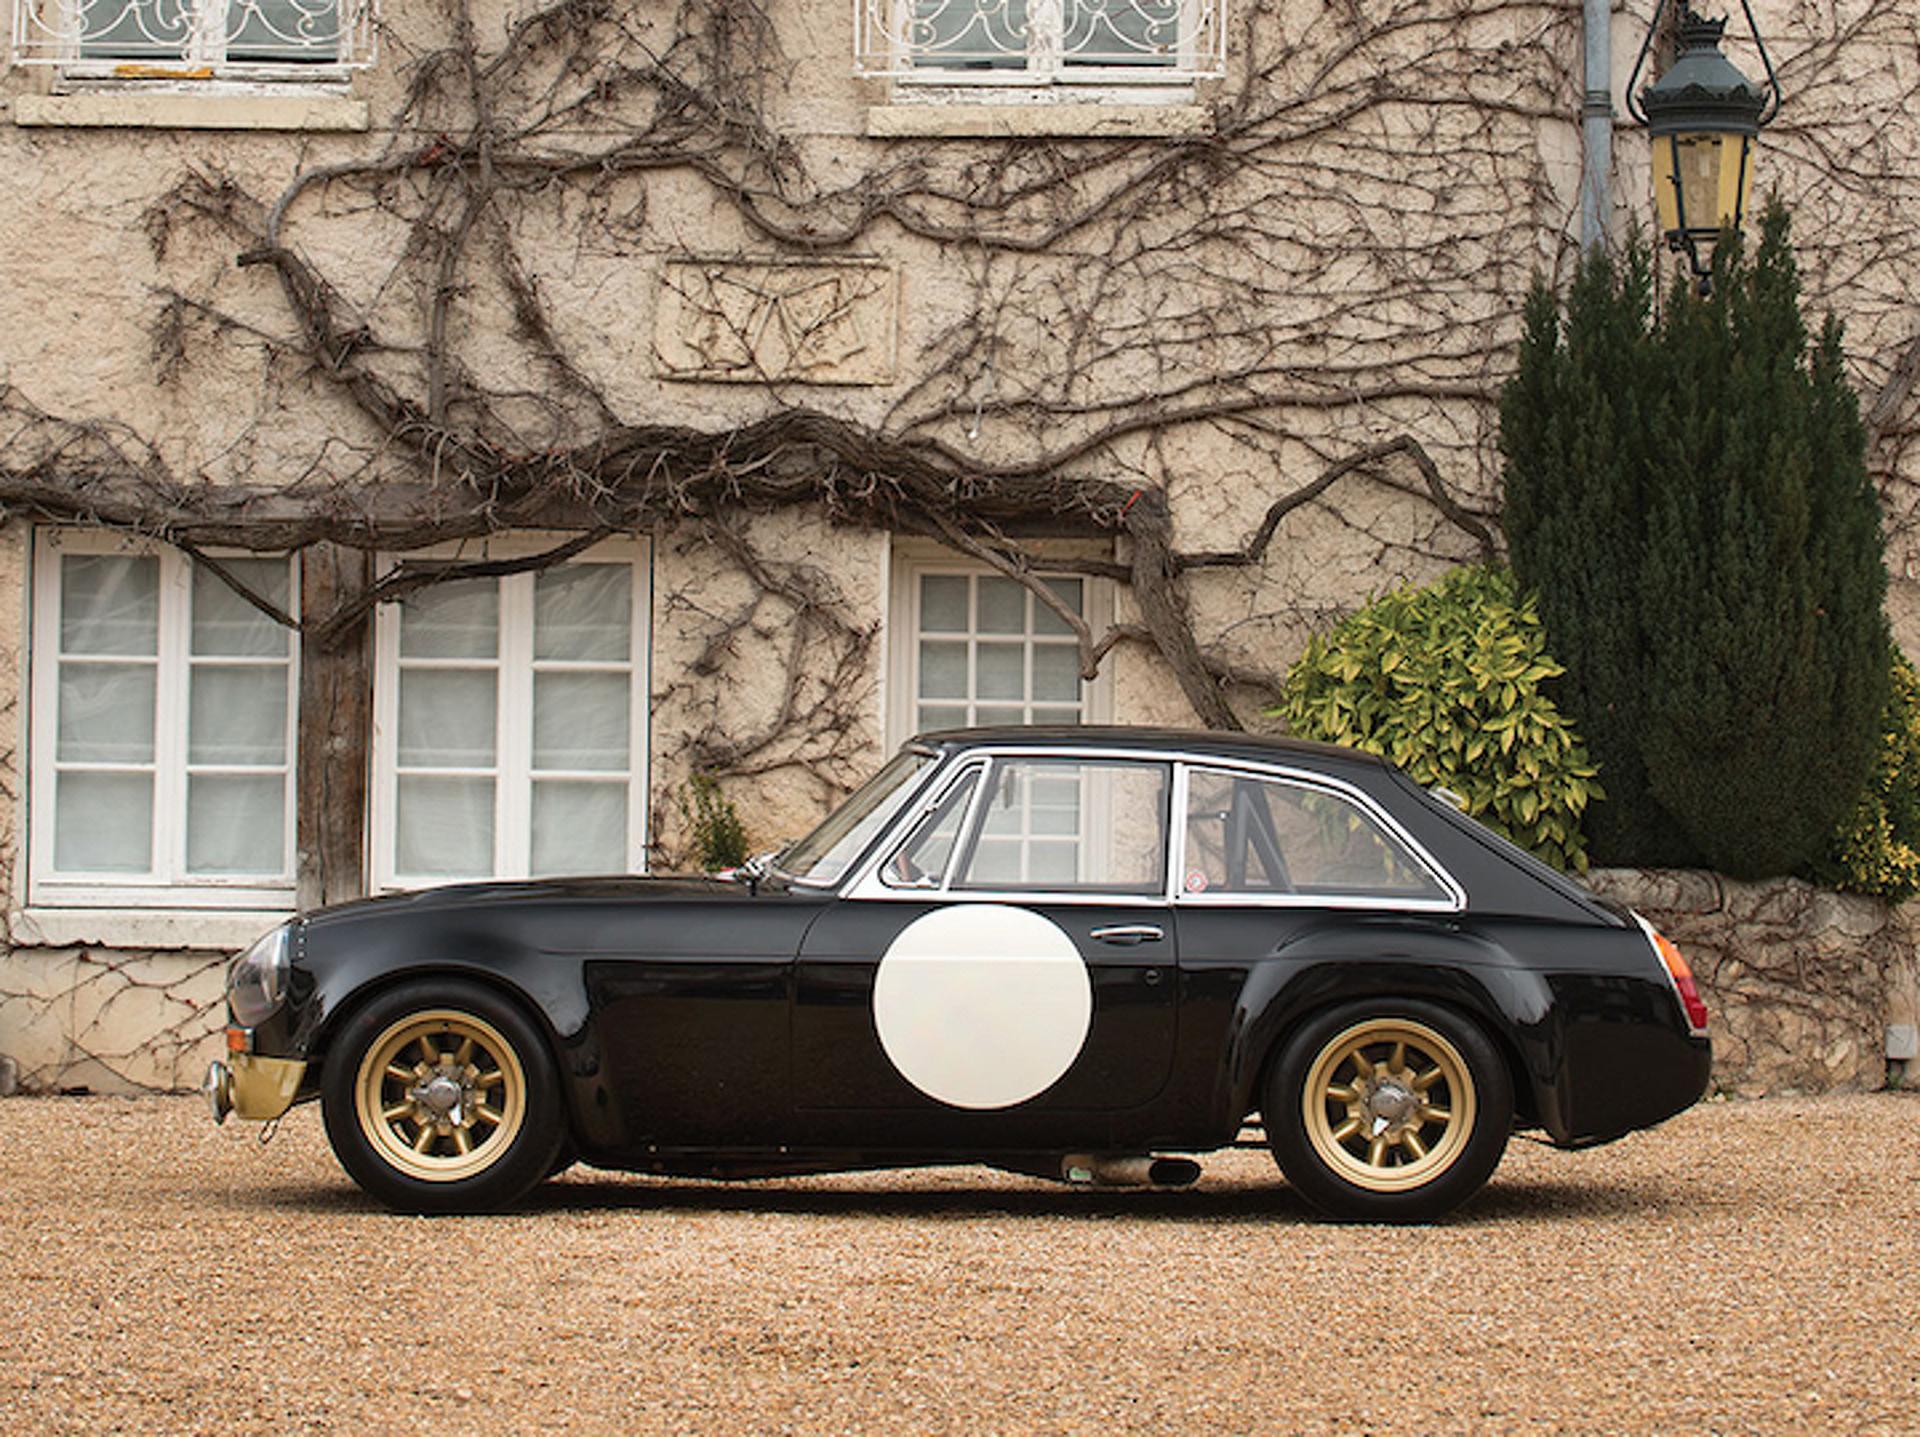 Beautiful Mg Race Car For Sale Images - Classic Cars Ideas - boiq.info